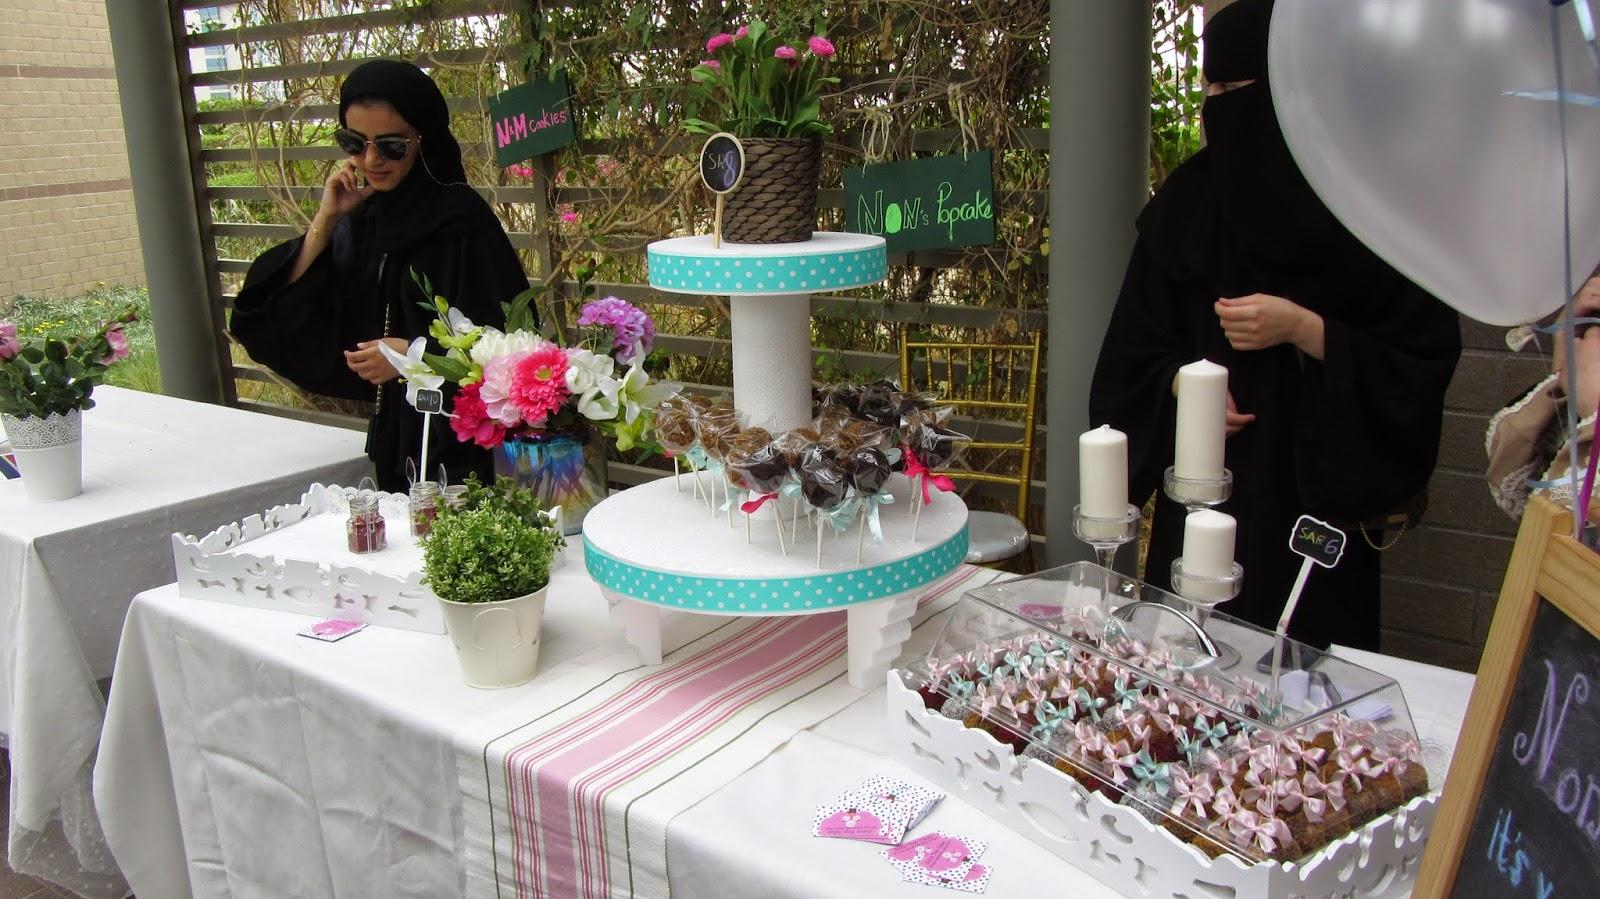 Mathaq Taste of Art Food Khobar Saudi N&M Non's Pop Cakes blog